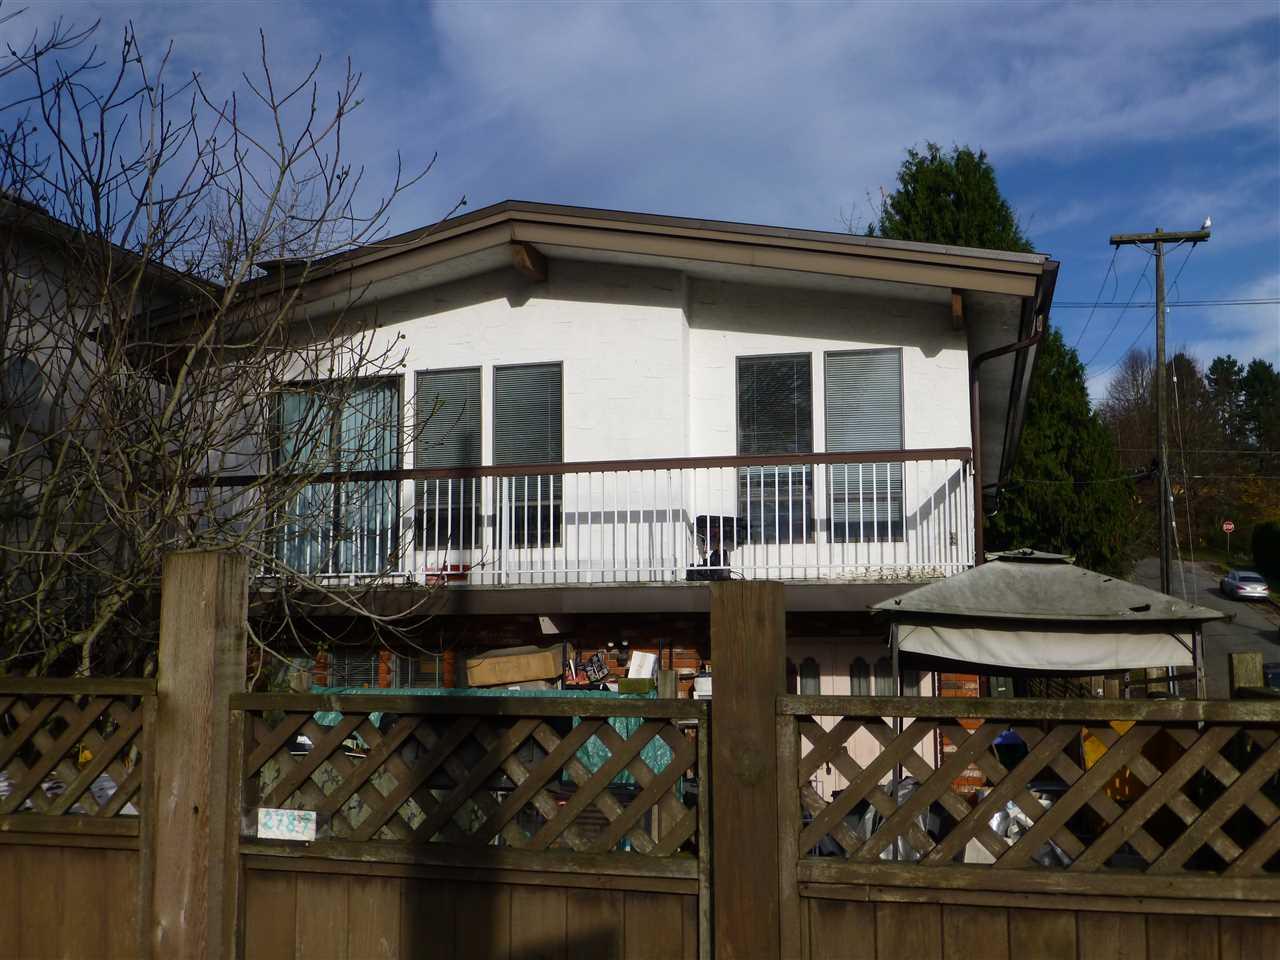 2789 E BROADWAY, Vancouver, BC V5M 1Y7